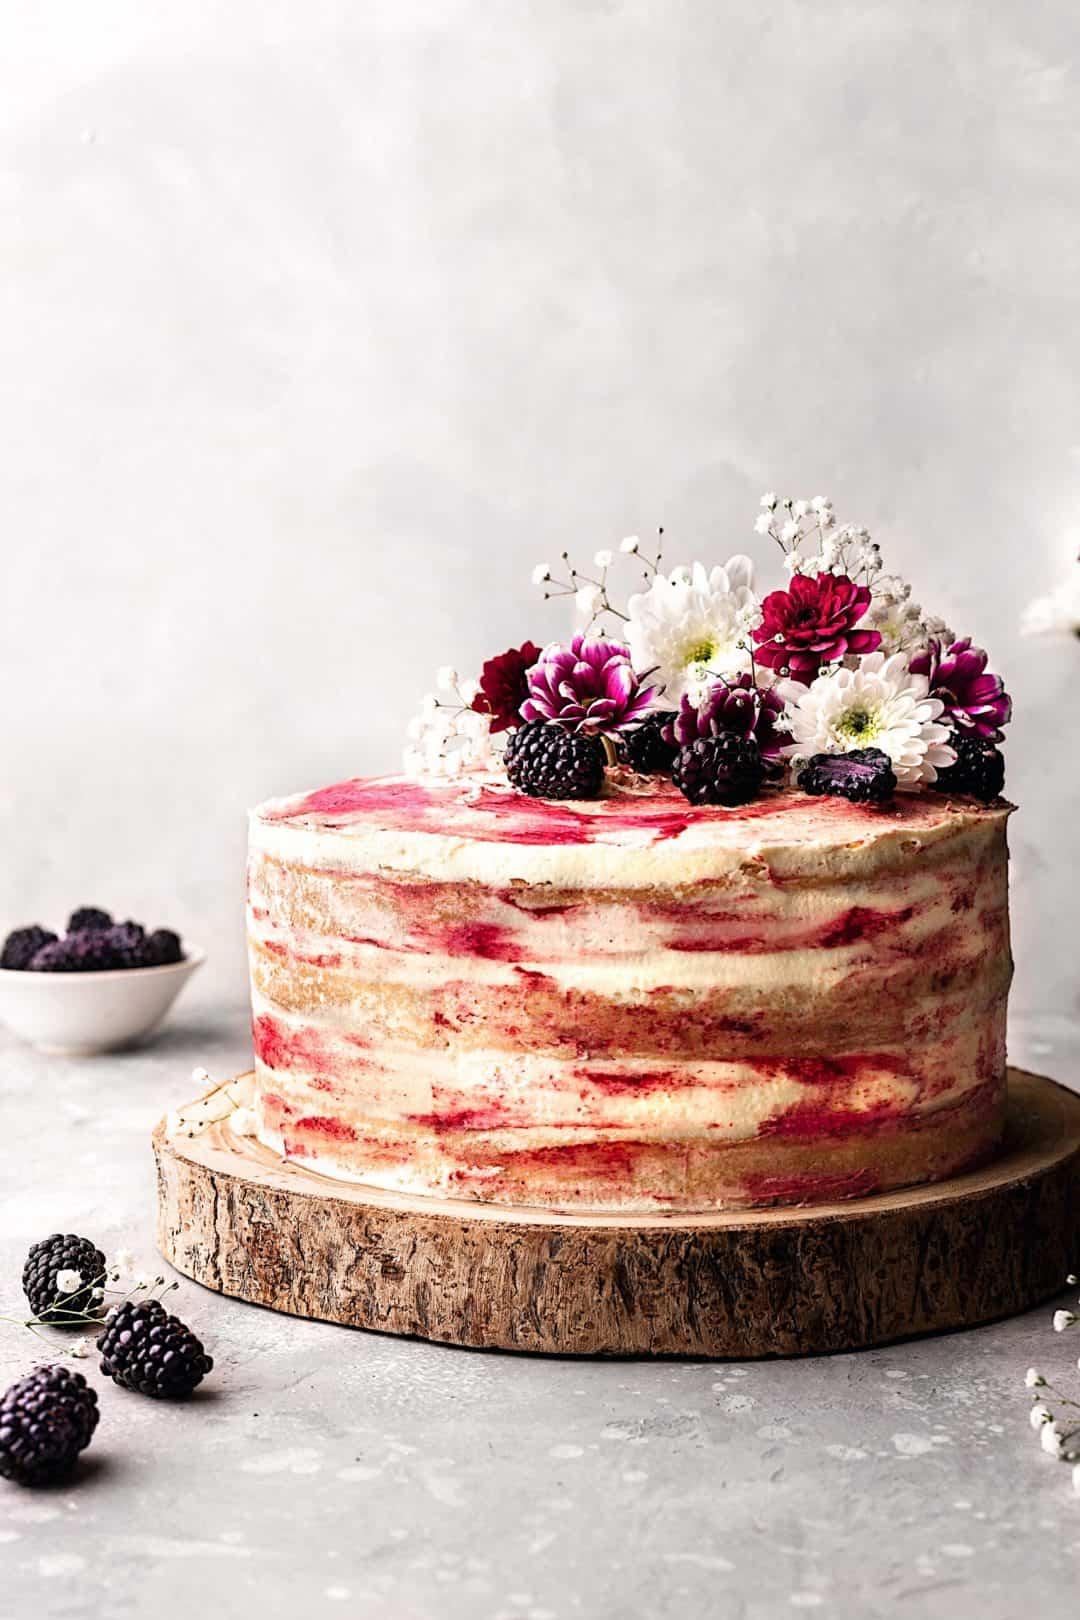 Vegan Blackberry and Gin Cake #cake #recipe #vegan #vegancake #dairyfree #blackberry #gin #seedlip #fruit